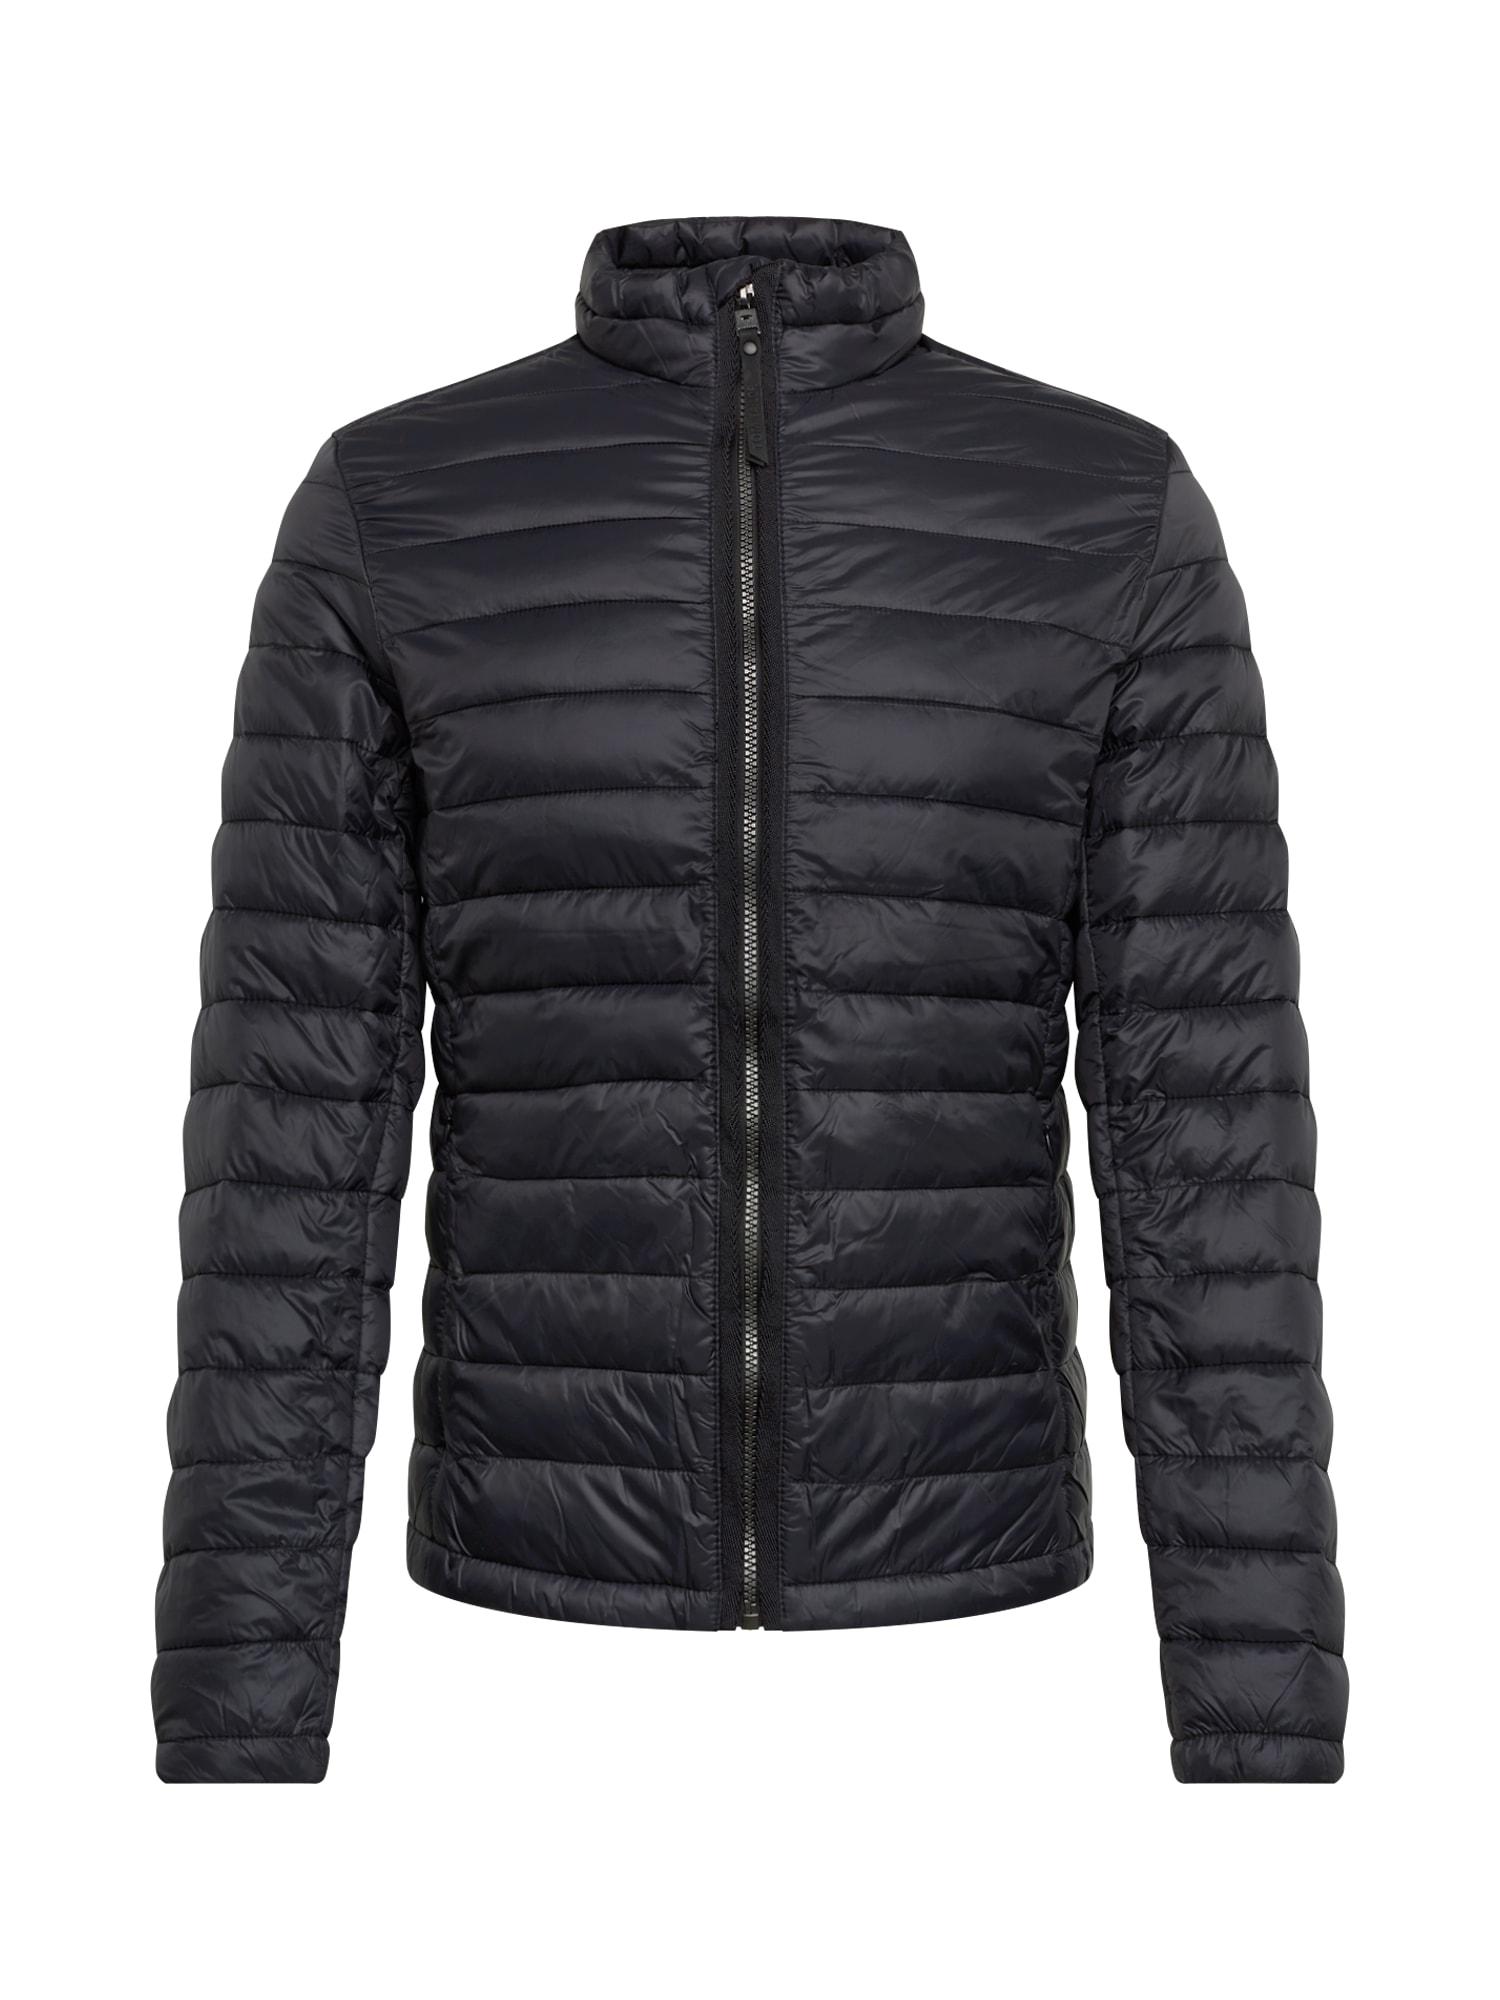 TOM TAILOR Téli dzseki 'light weight jacket'  fekete